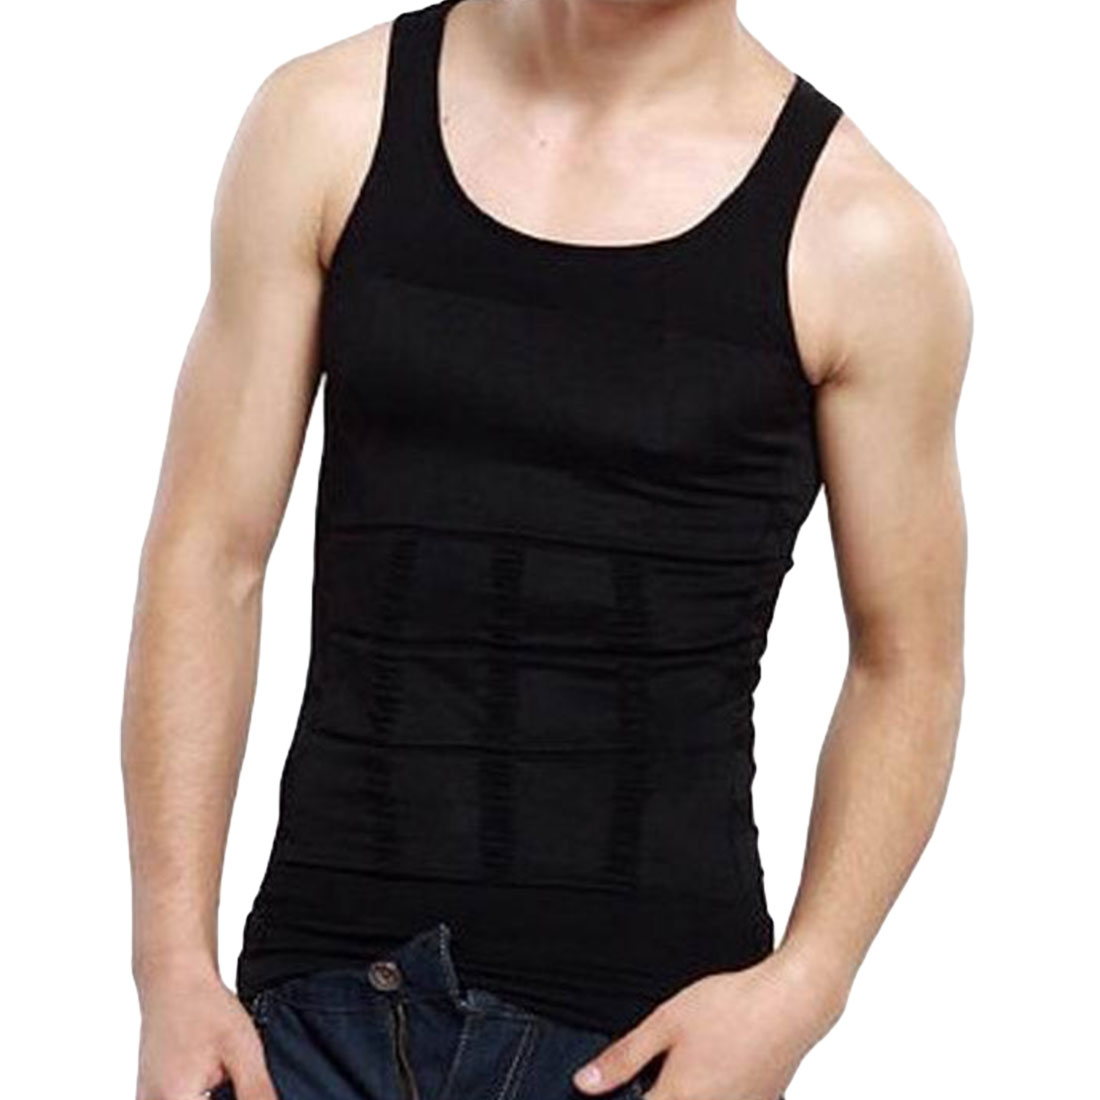 Sous Vetement Hommes  Lift Men's Body Sculpting Slimming Vest,Waist And Abdomen Underwear Less Beer Belly Thin Chest Waist V